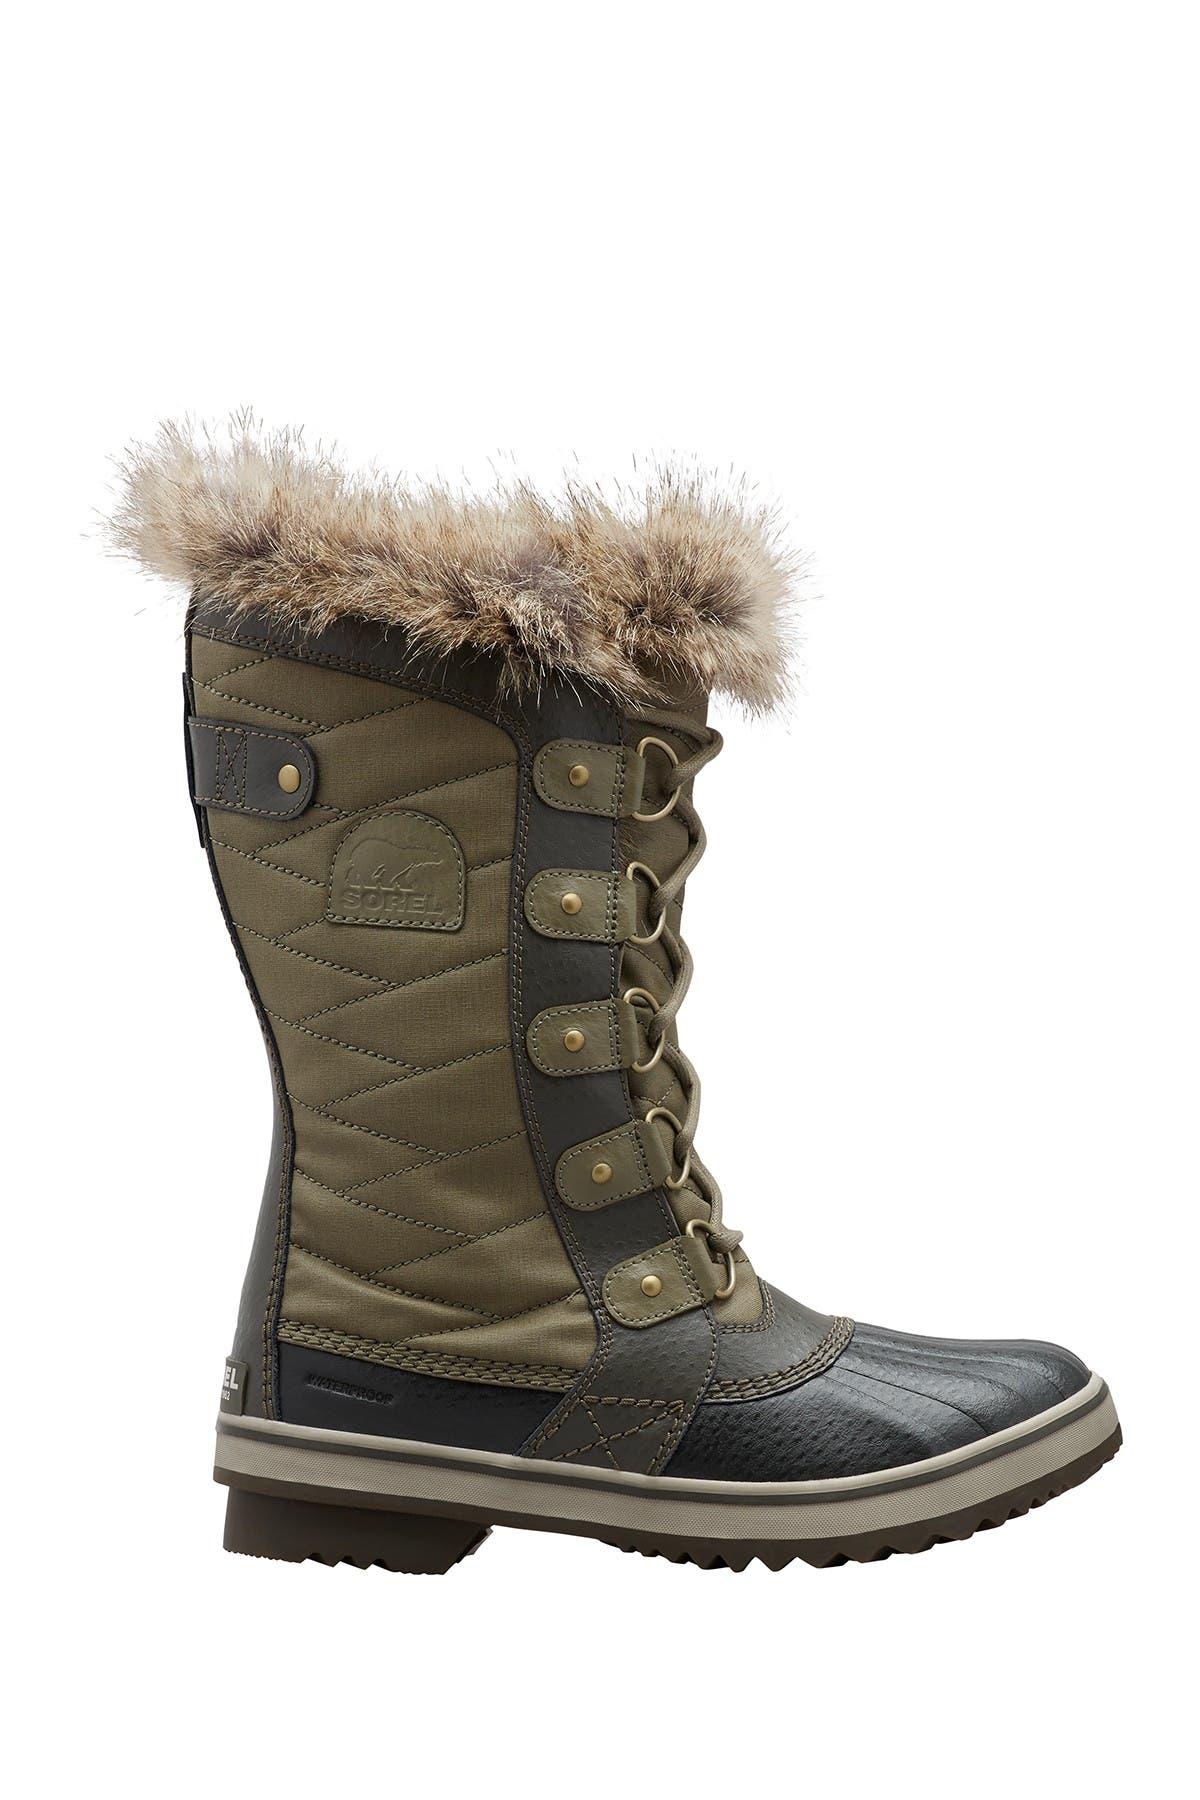 Image of Sorel Tofino II Faux Fur Trim Waterproof Boot